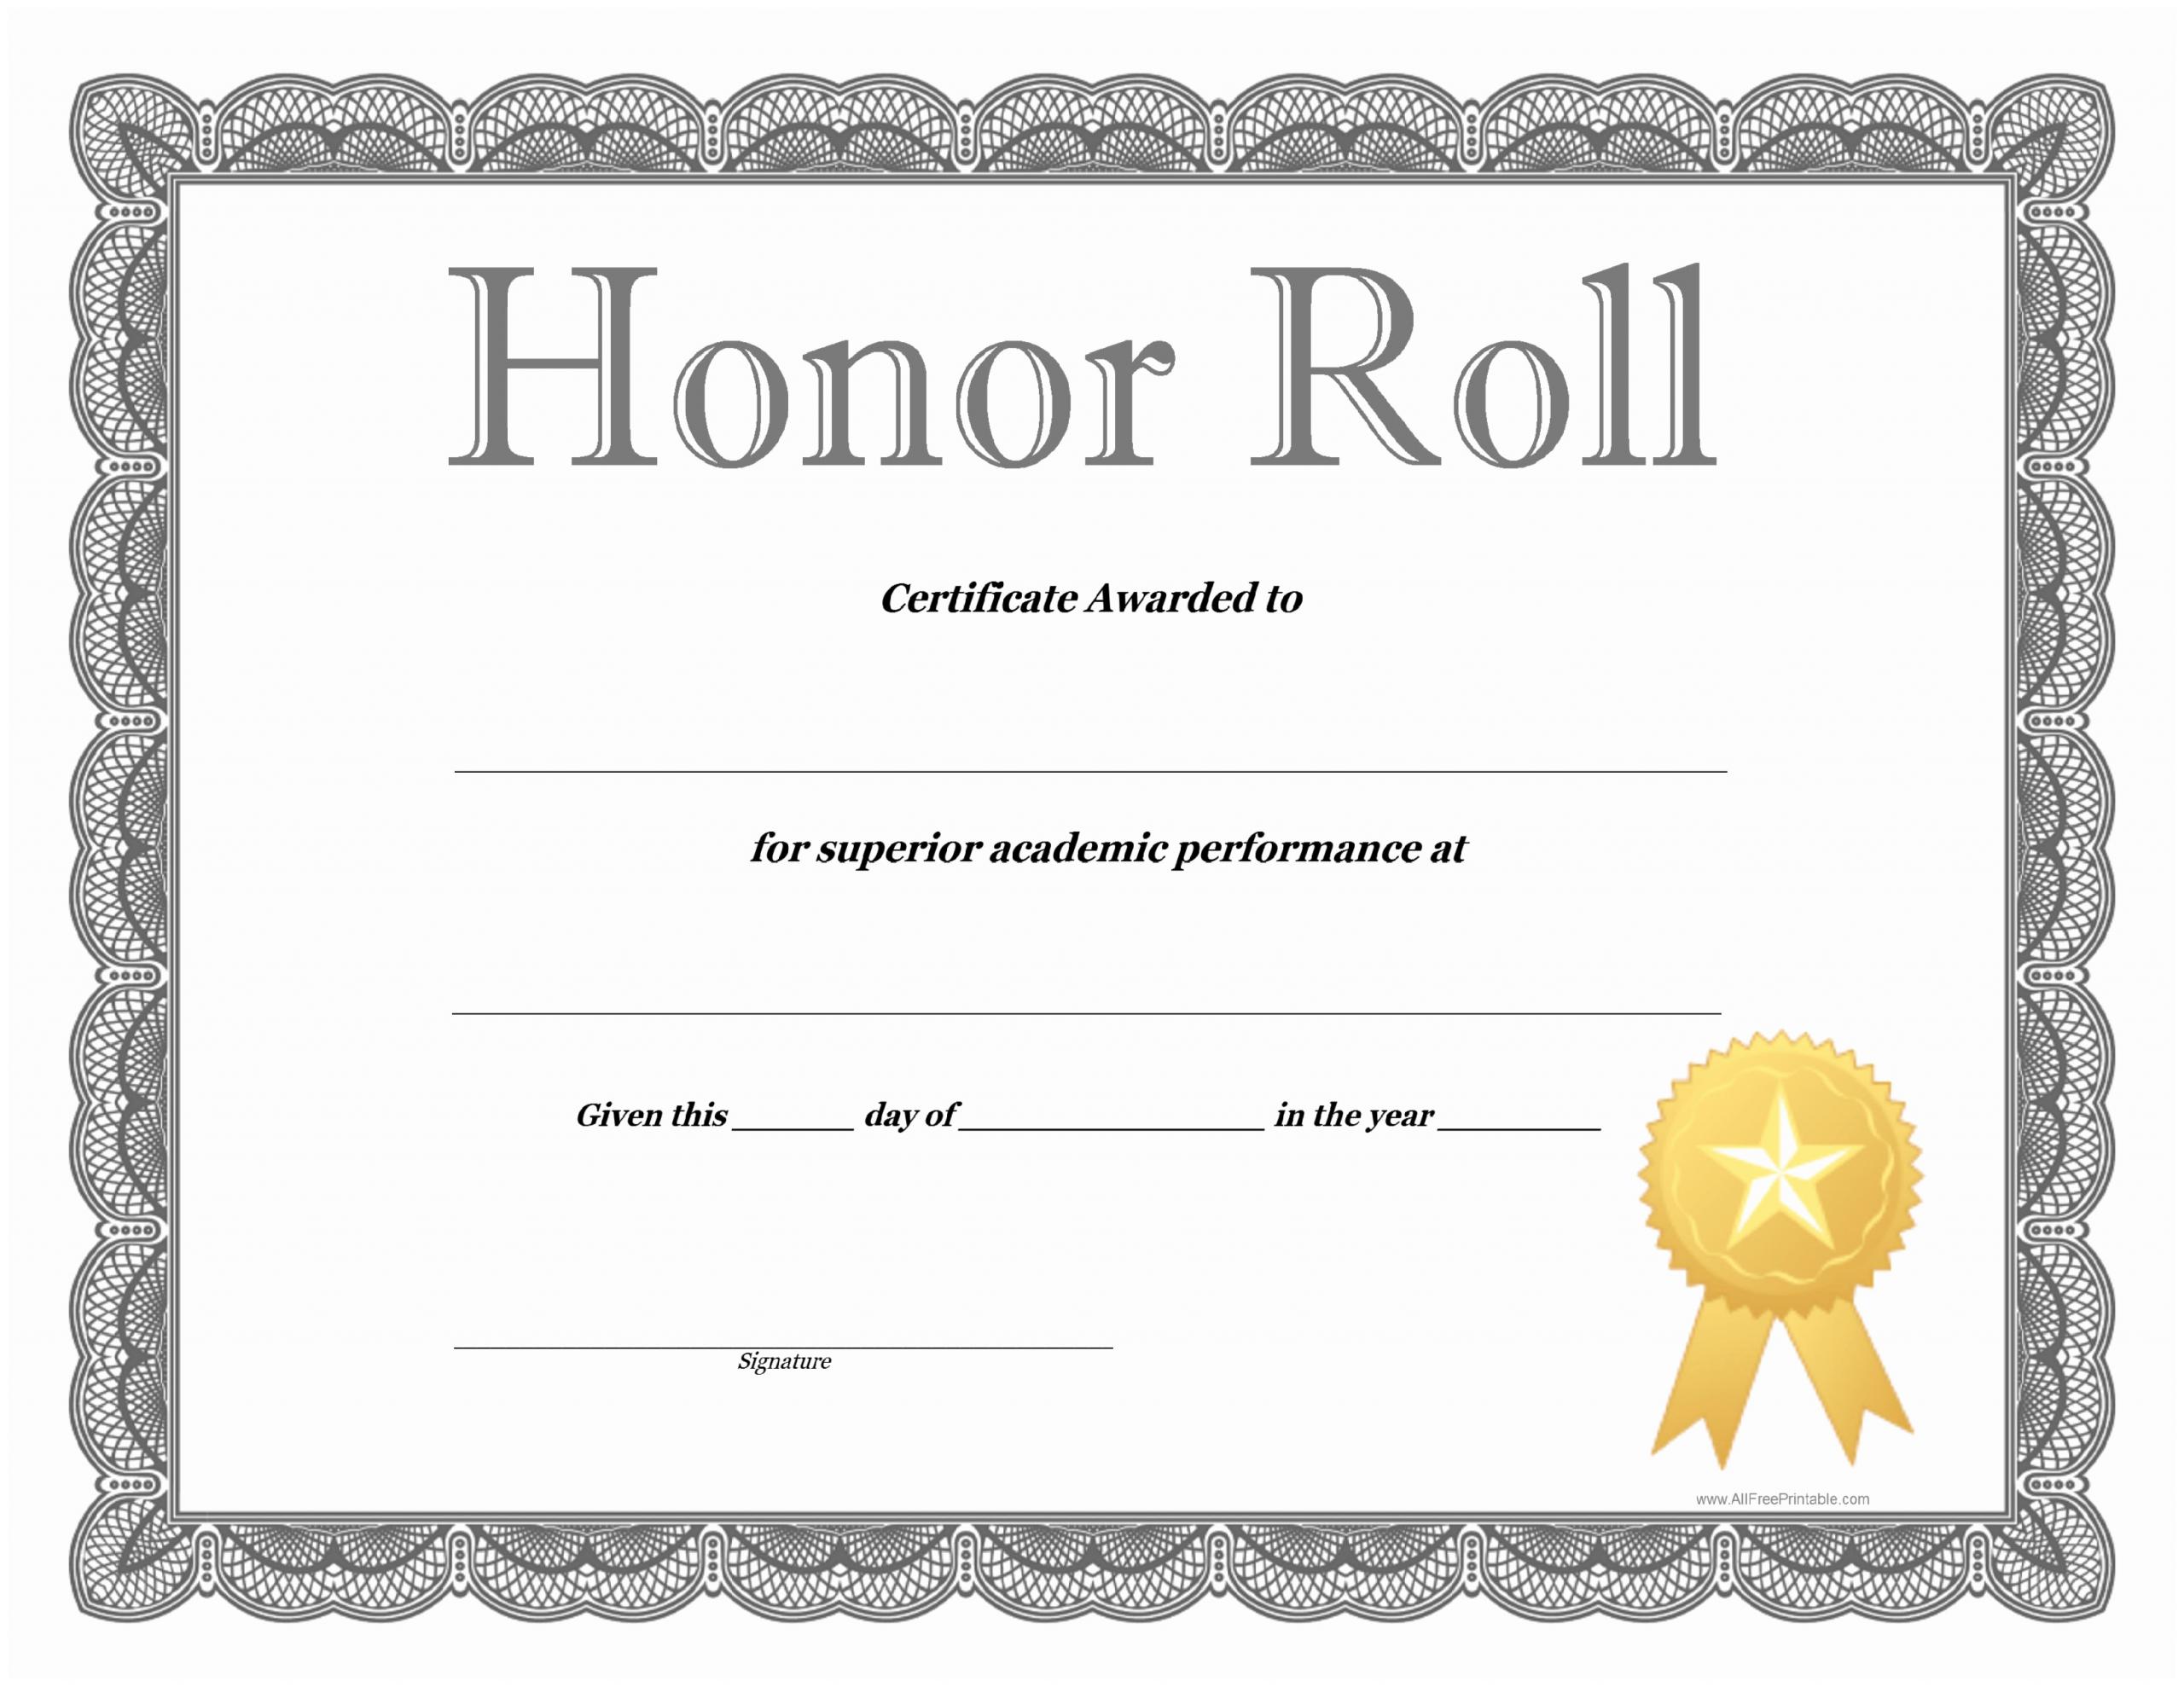 Editable Honor Roll Certificate Beautiful Honor Roll Certificate Template How to Craft A